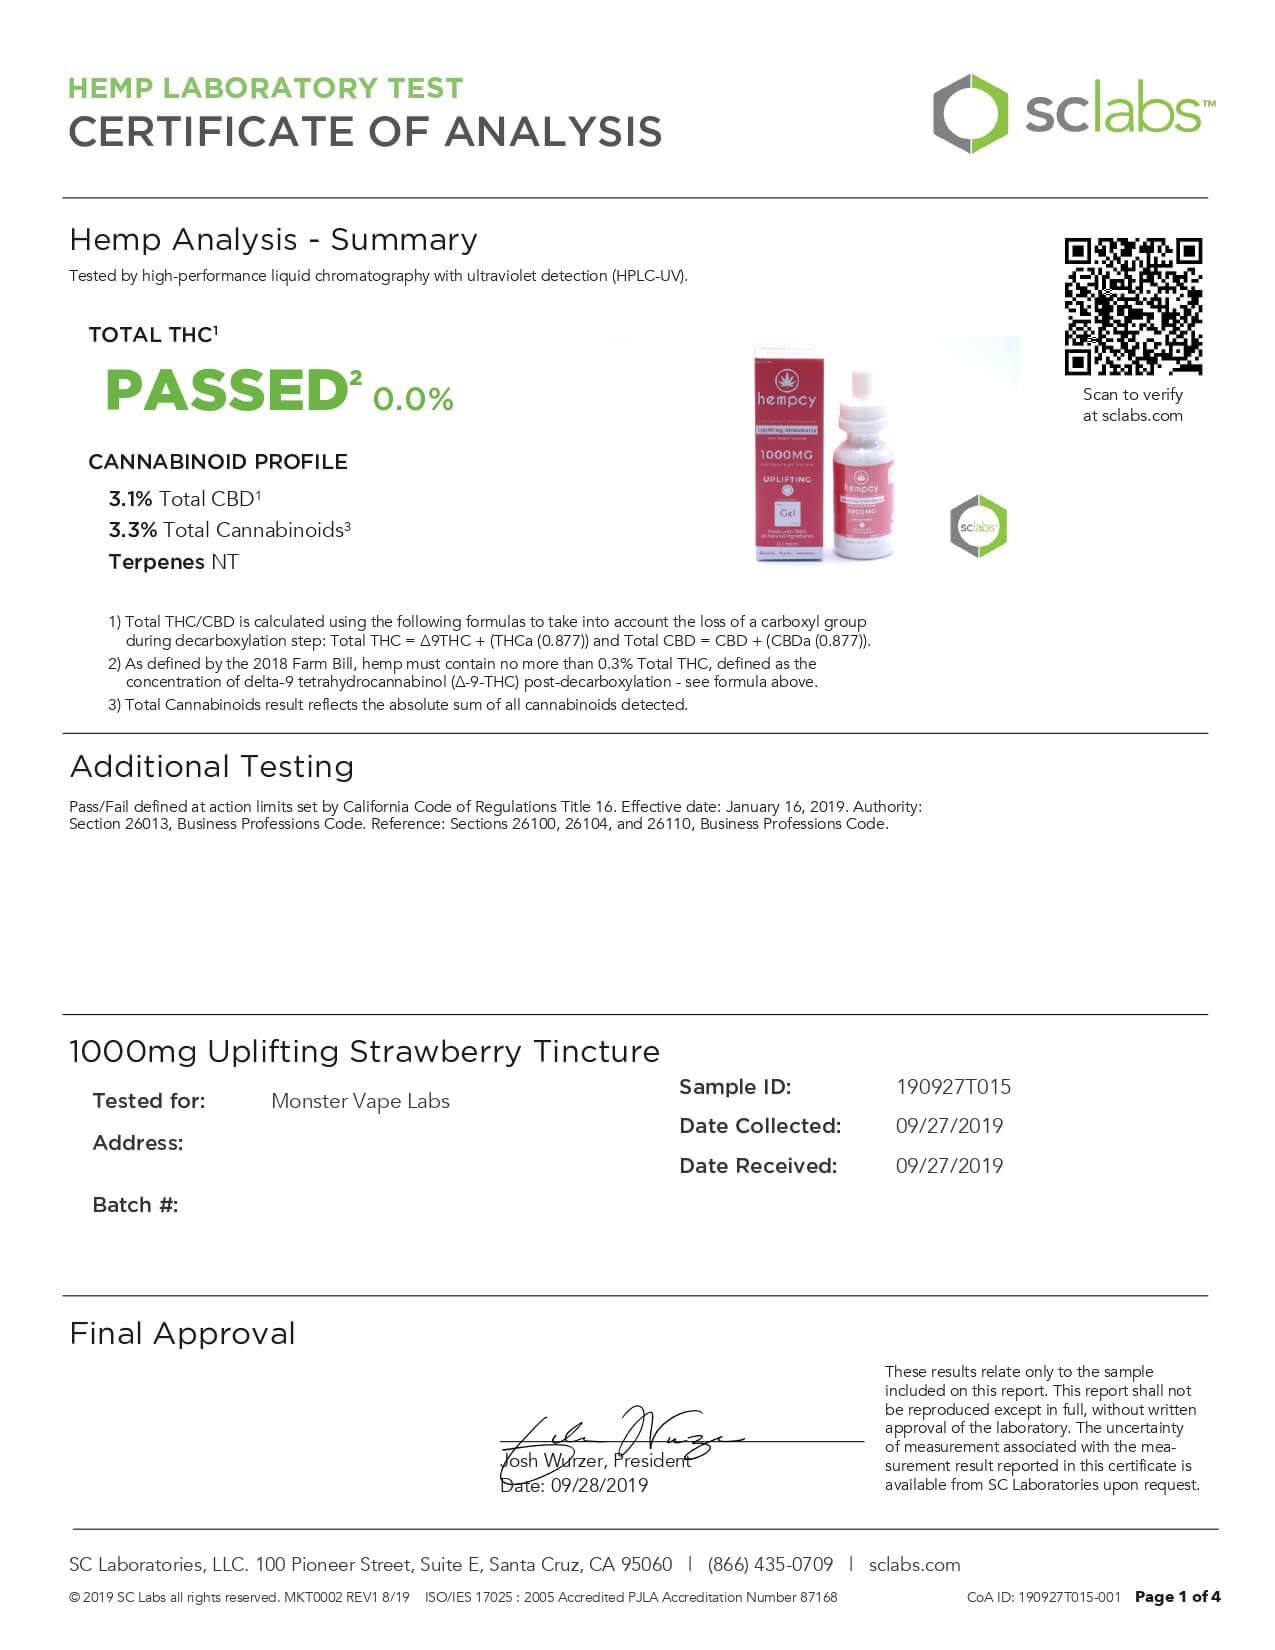 Hempcy CBD Tincture Uplifting Strawberry 1000mg Lab Report